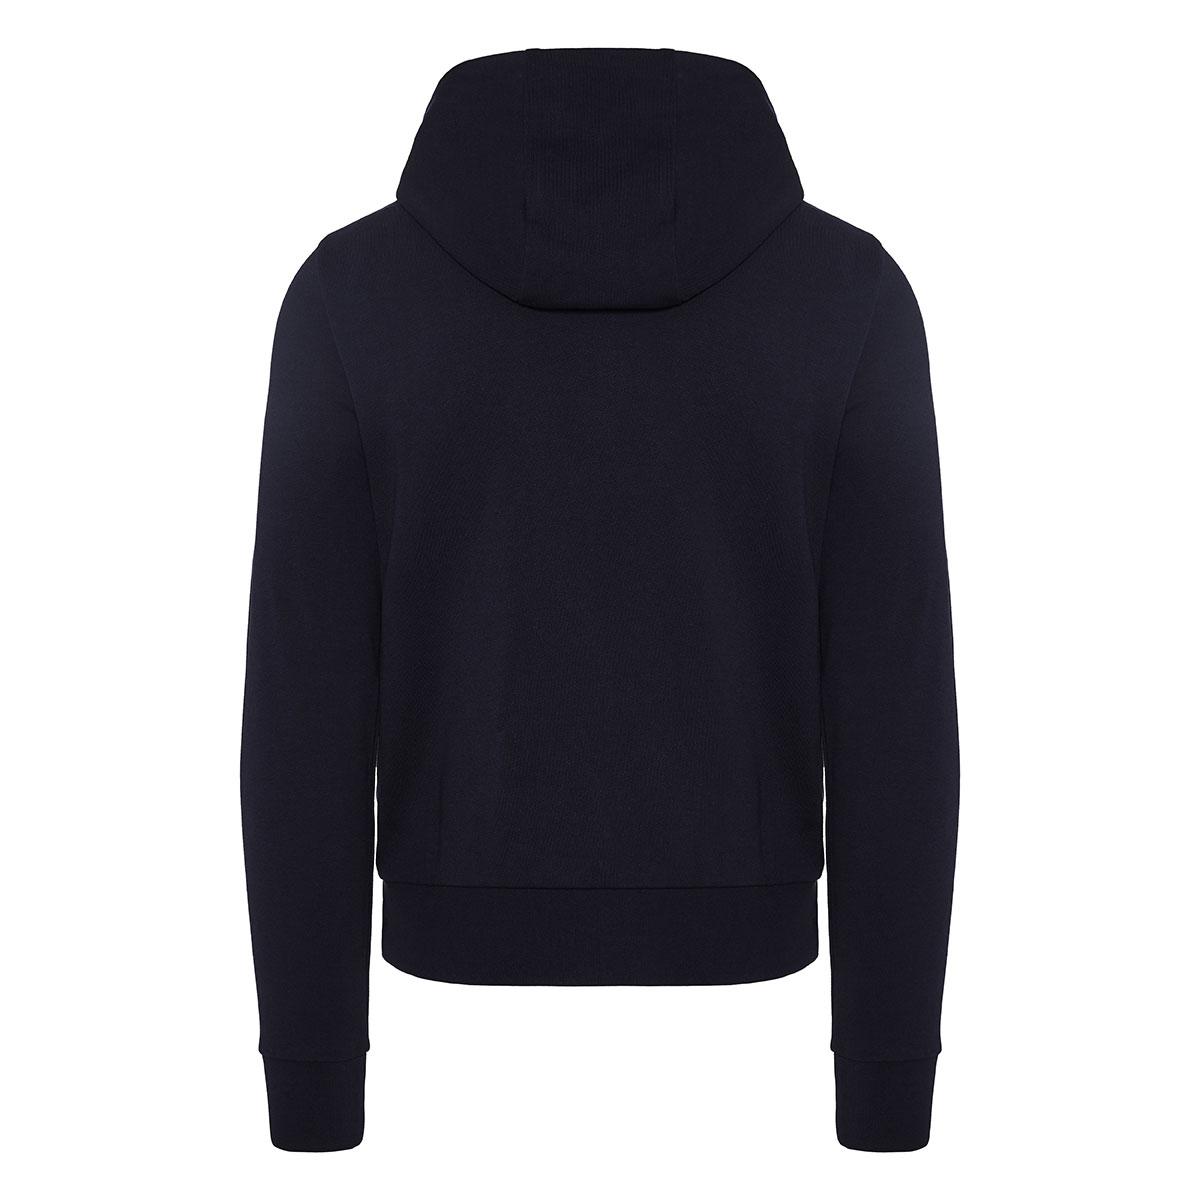 Nylon-paneled zipper hoodie